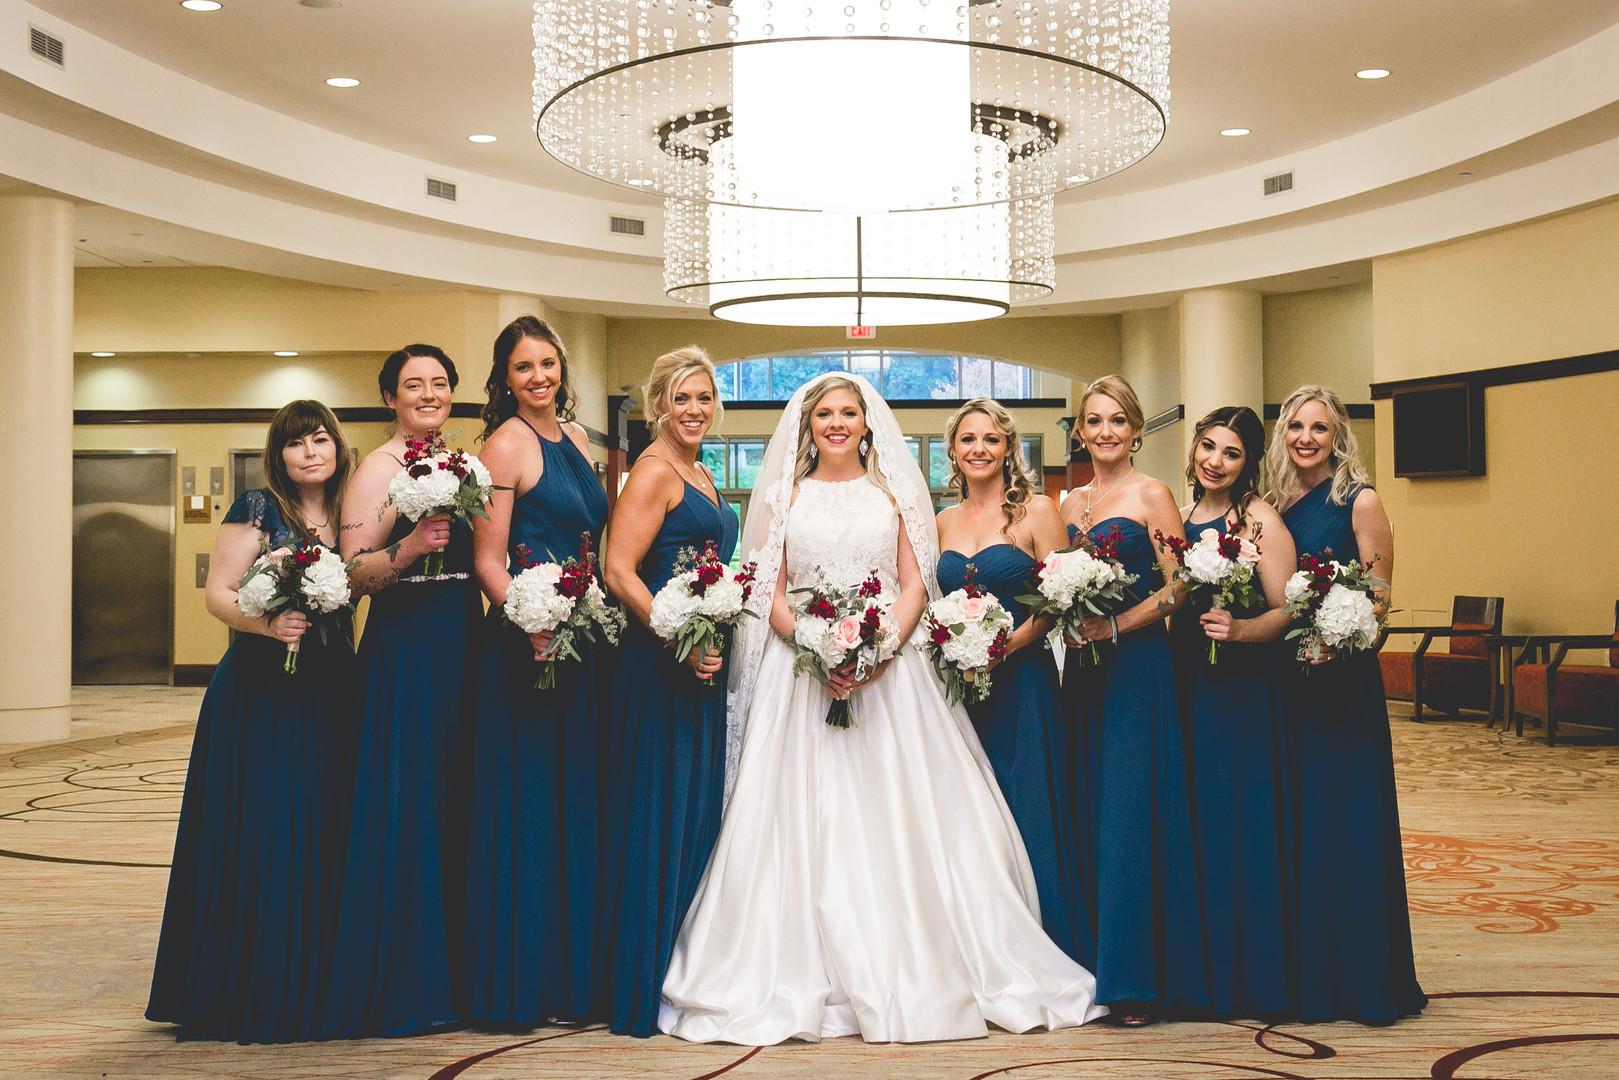 wedding-photo-bride-groom-68.jpg